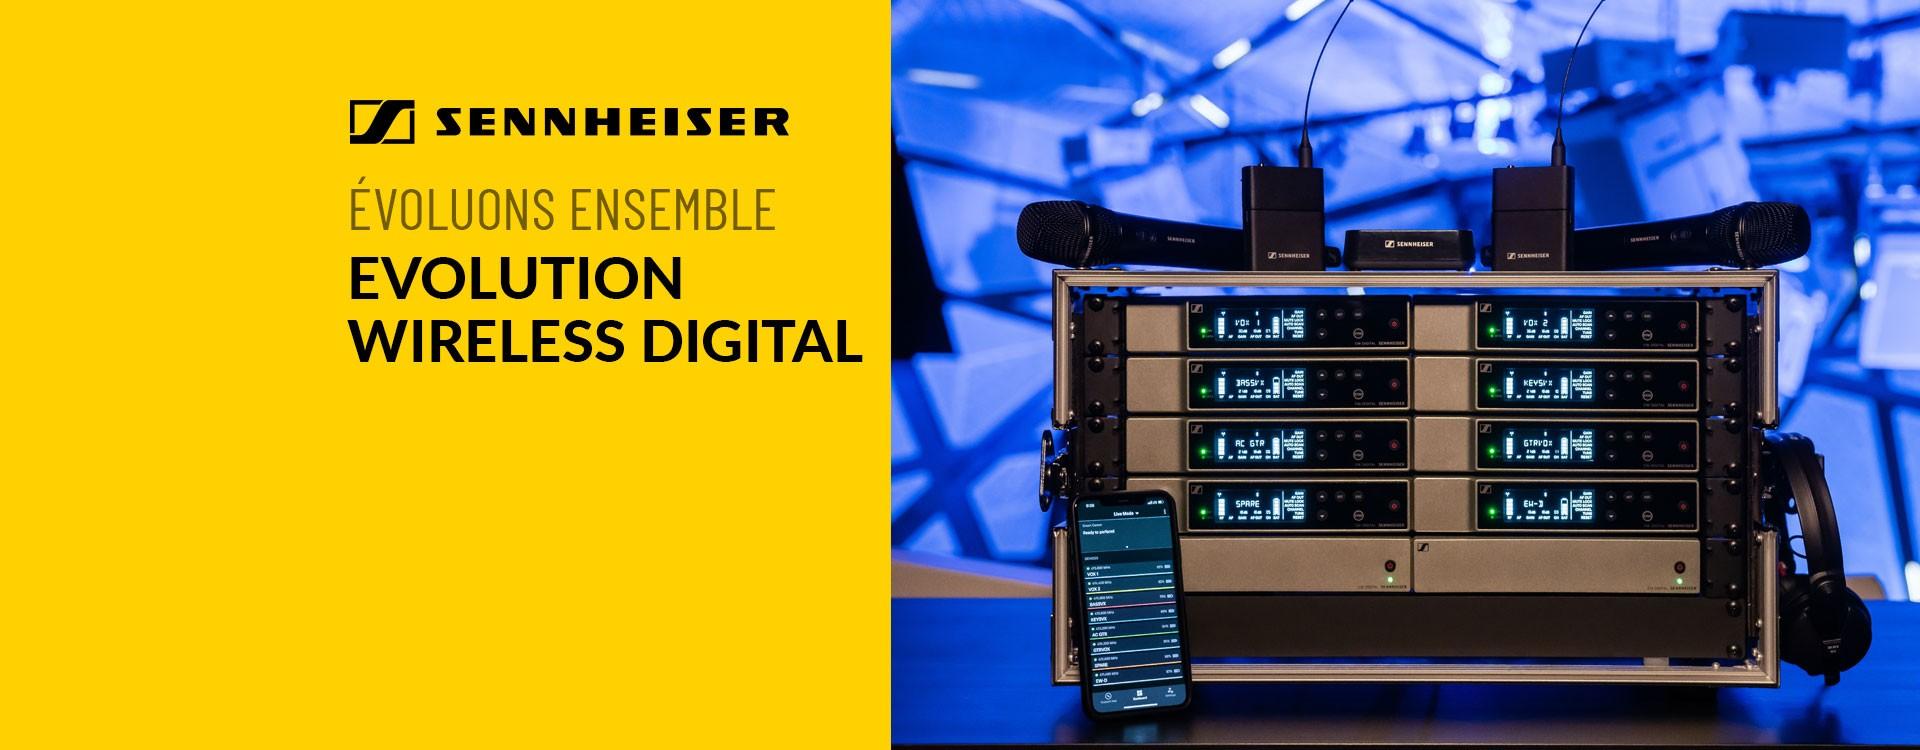 Sennheiser annonce sa solution audio sans fil Evolution Wireless Digital